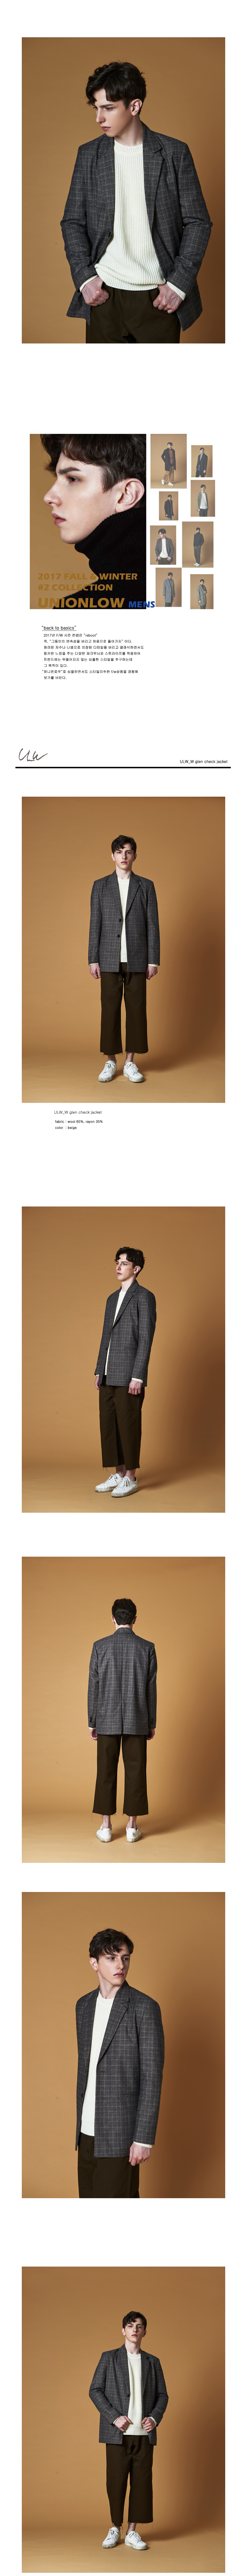 ulw-w-glen-check-jacket_1.jpg